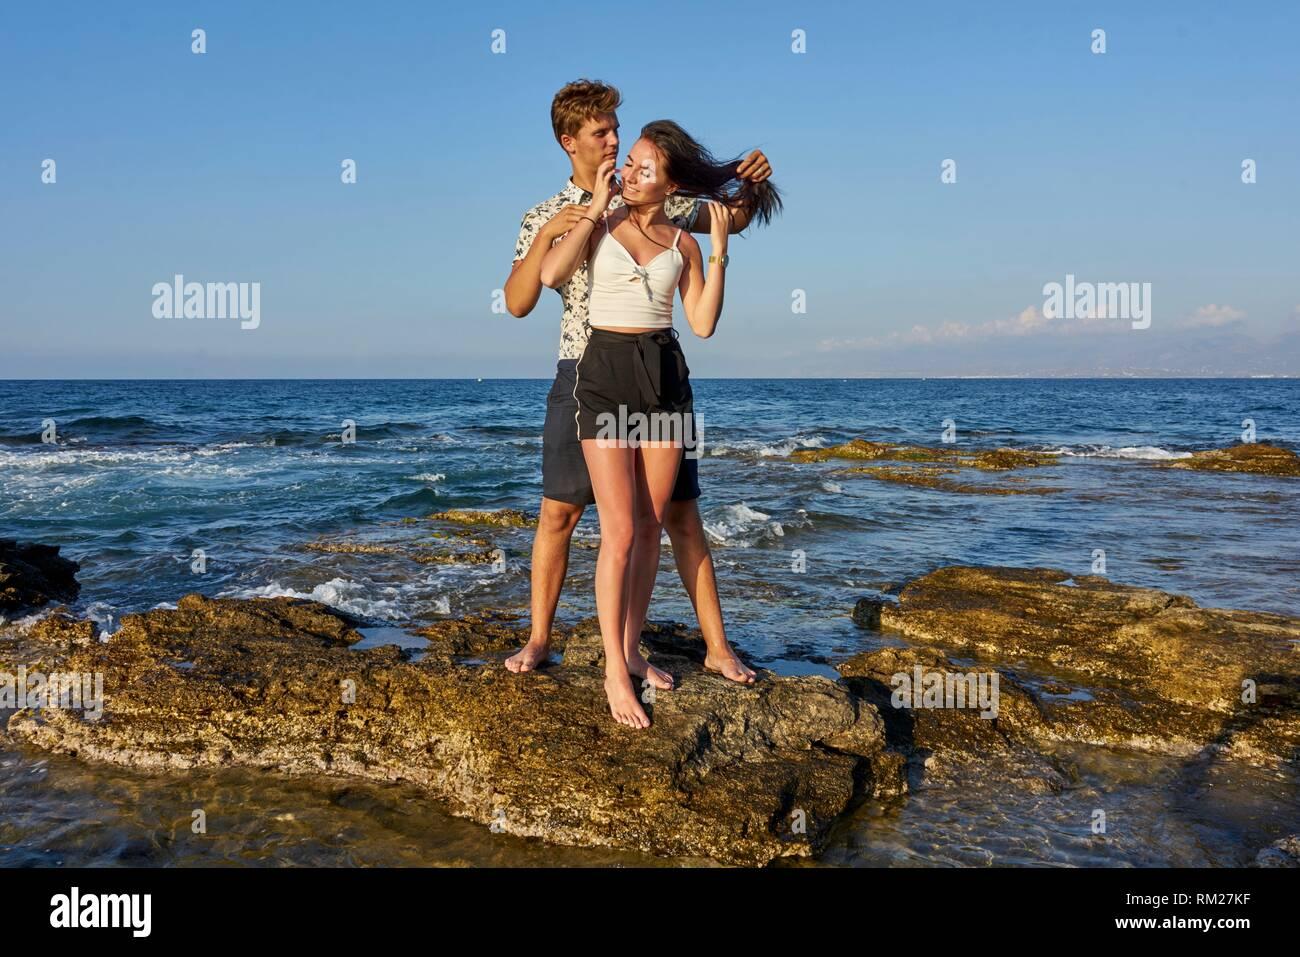 Couple standing on rocks, seaside, holiday, love, lovers. Chersonissos, Crete, Greece. - Stock Image